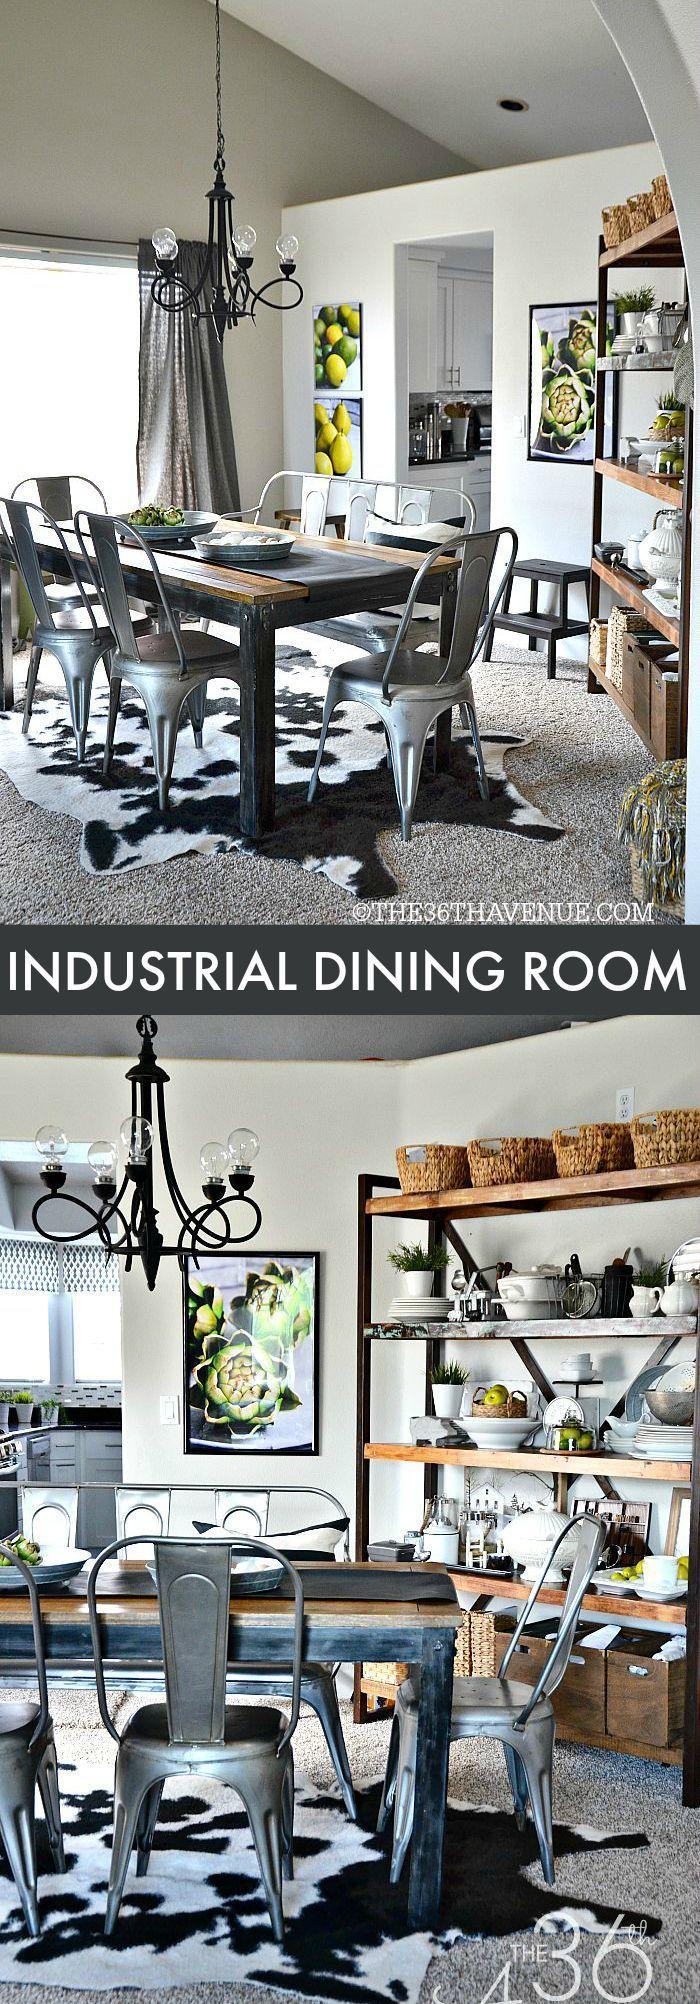 Scandinavian Dining Room Design Ideas amp Inspiration